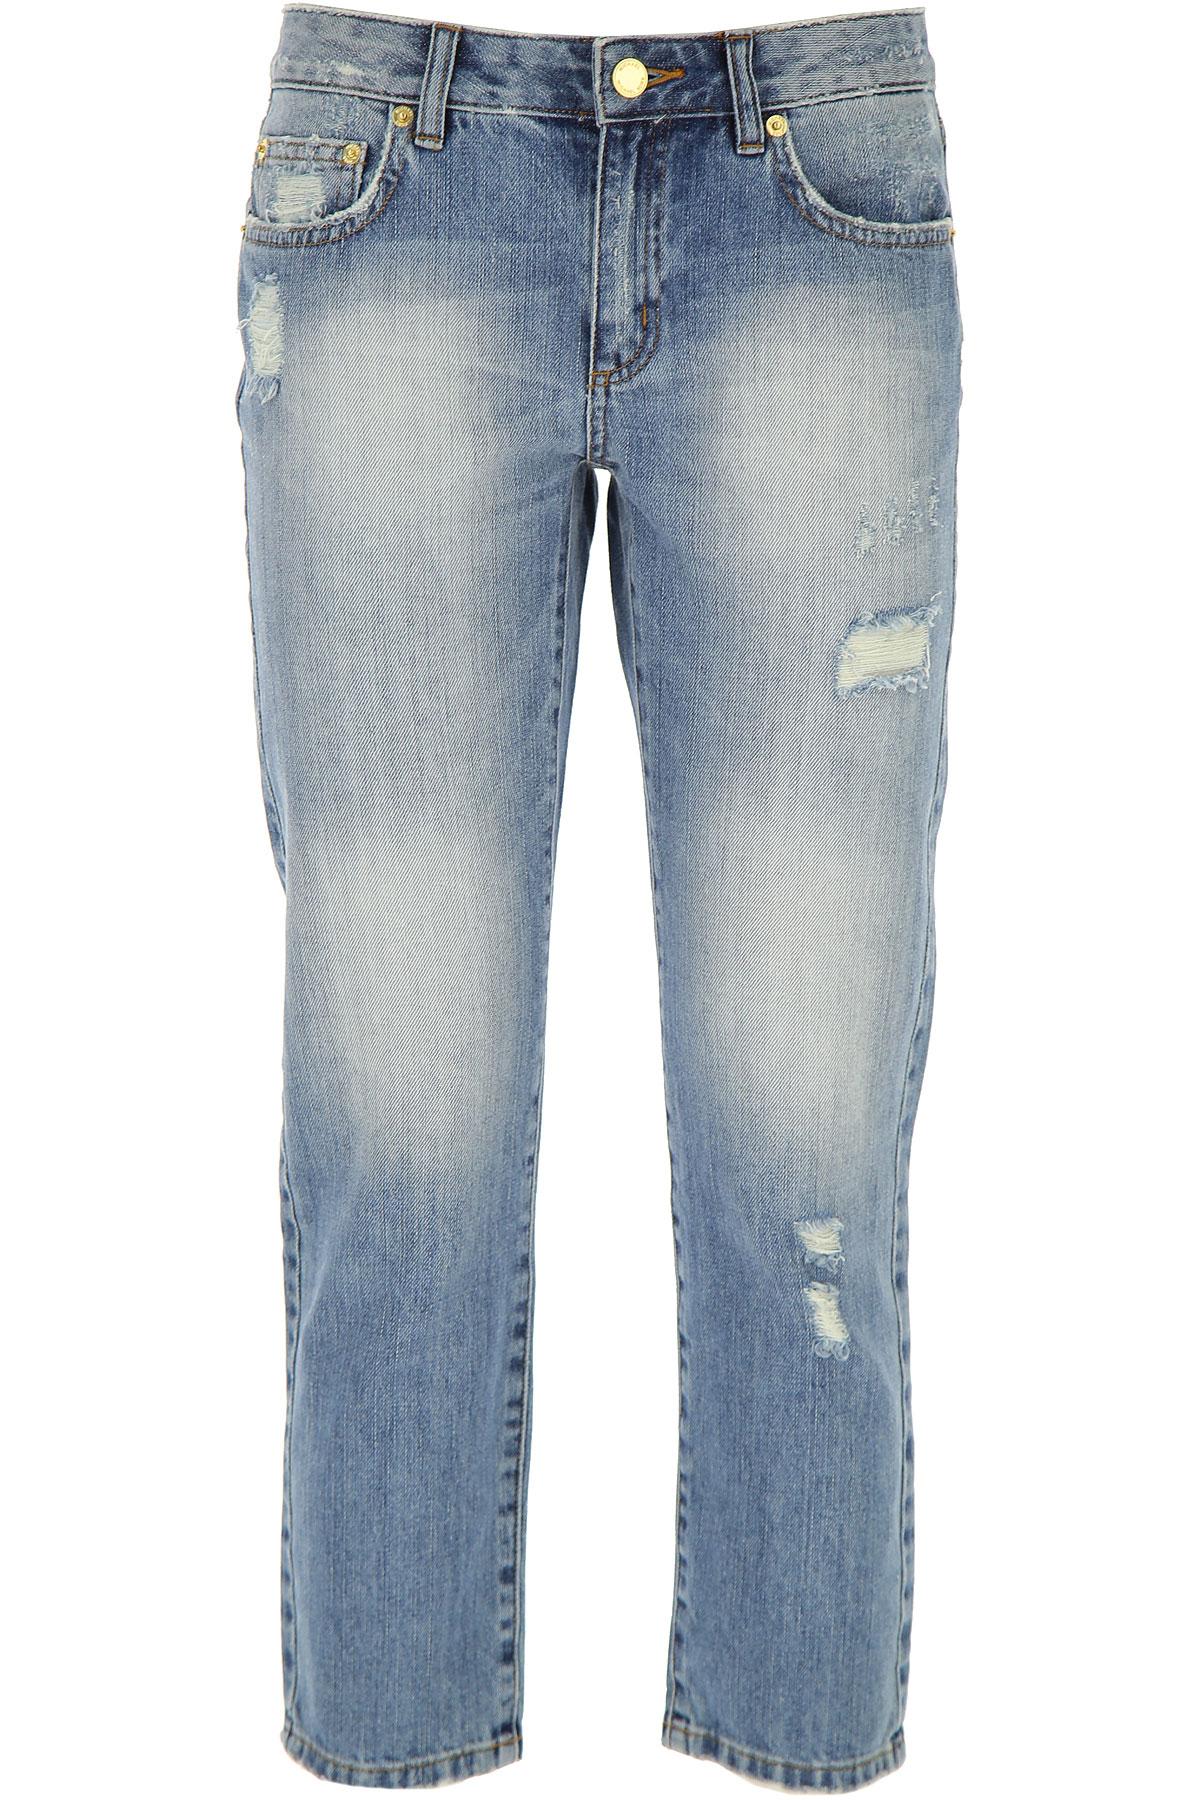 MICHAEL KORS Michael Kors Jeans, Bluejeans, Denim Jeans für Damen Günstig im Outlet Sale, Helles Indigo., Baumwolle, 2017, 38 44